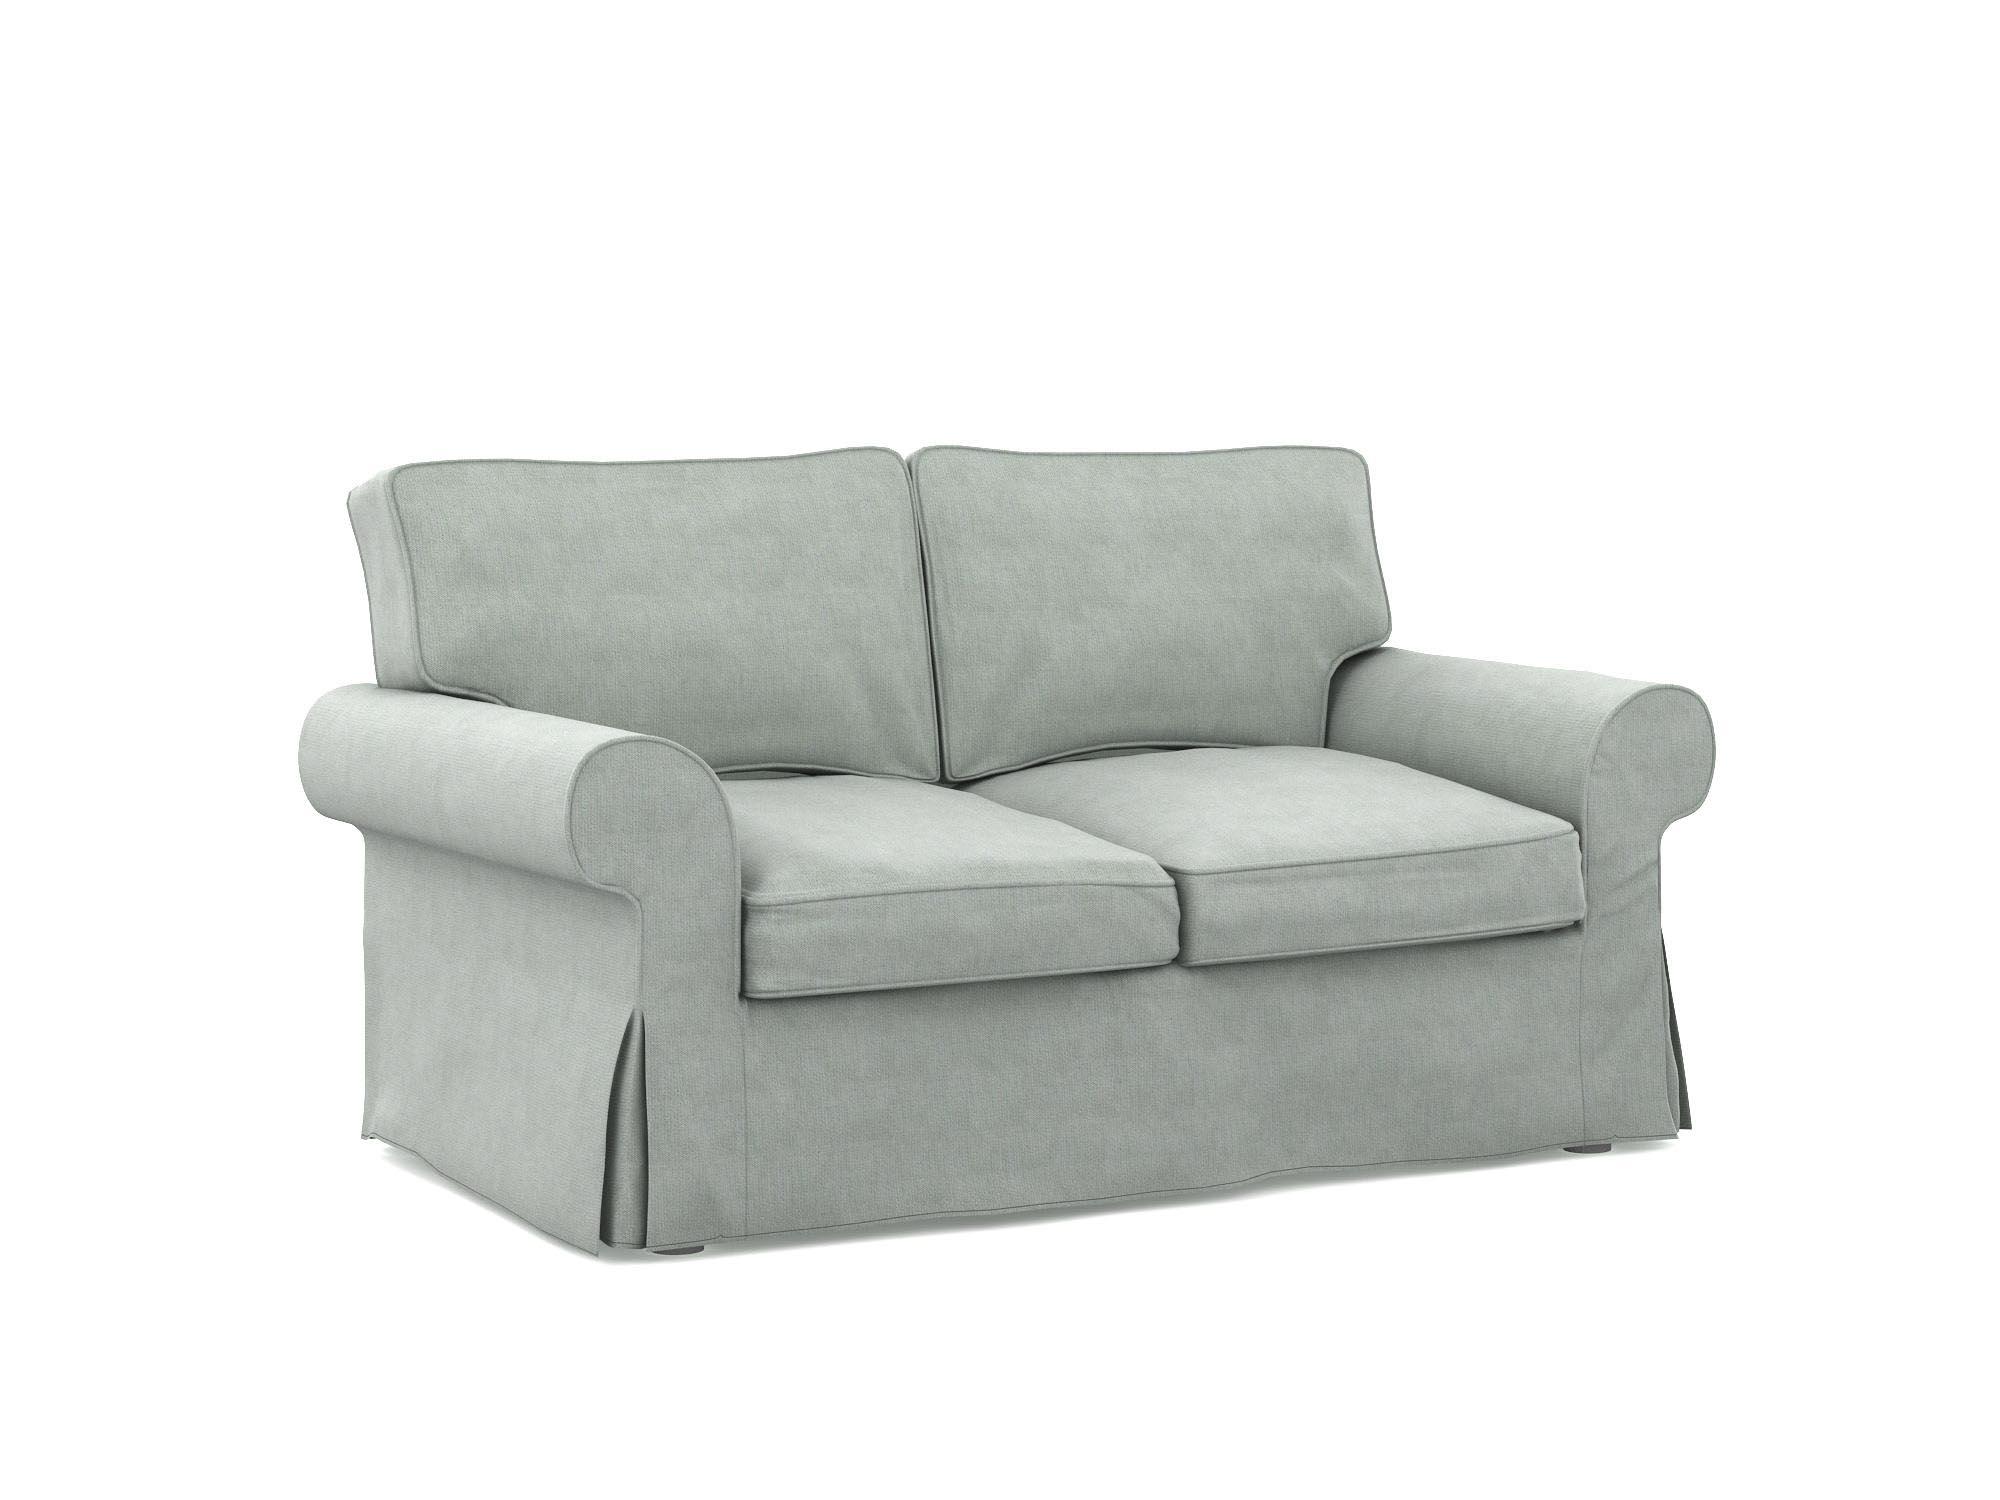 Ektorp 2 Sitzer Sofabezug Vidian De